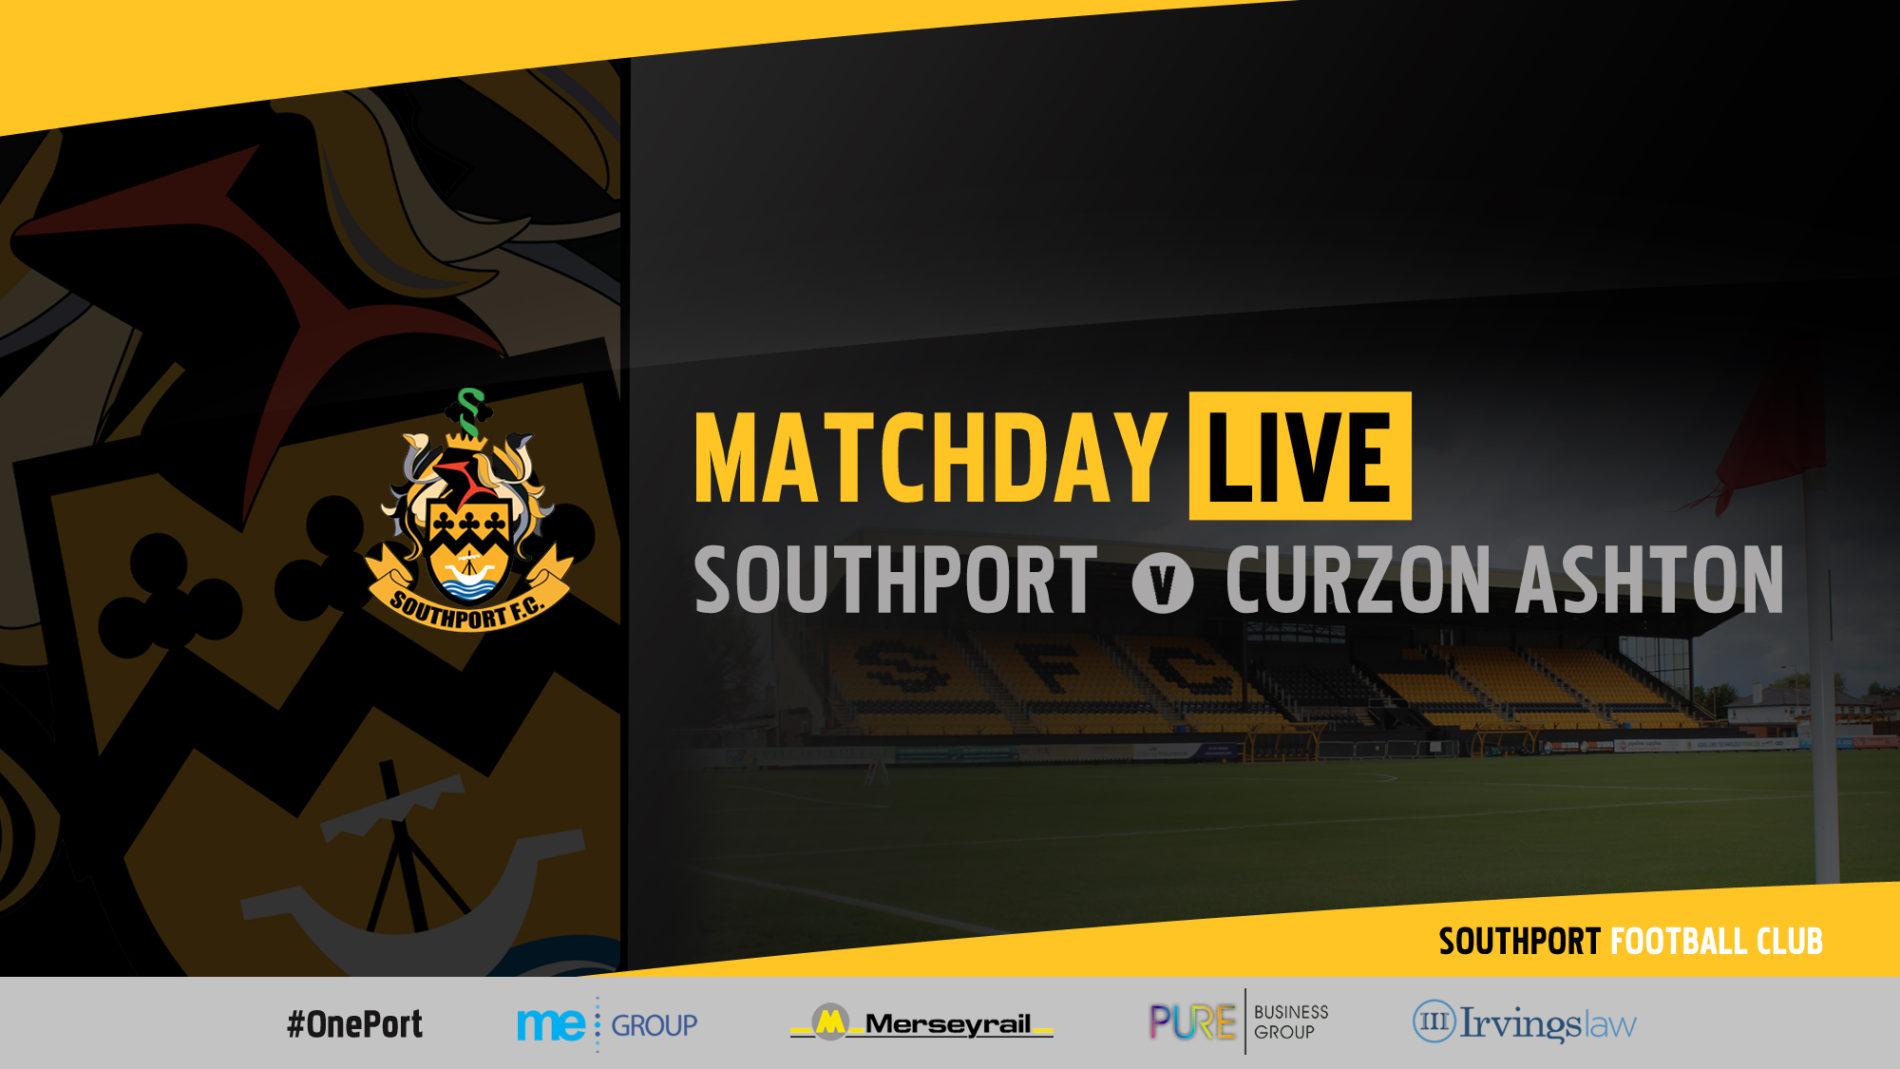 MATCHDAY LIVE | Southport v Curzon Ashton